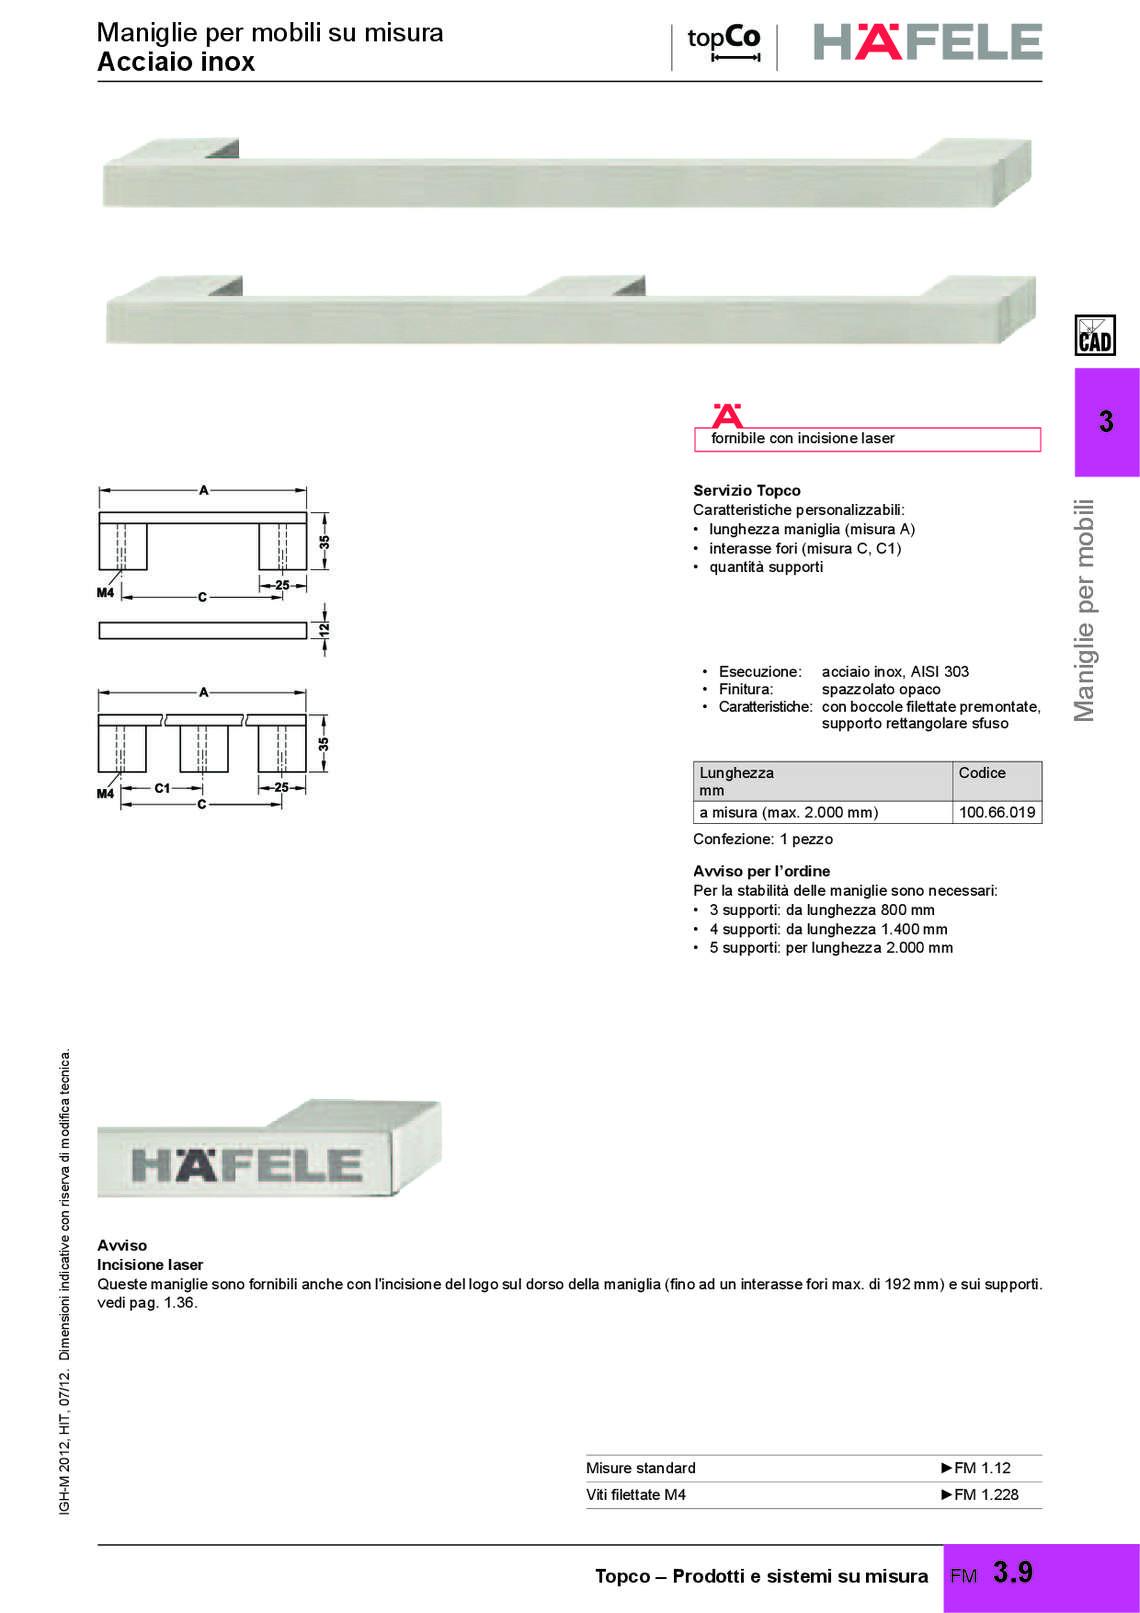 hafele-prodotti-su-misura_81_018.jpg